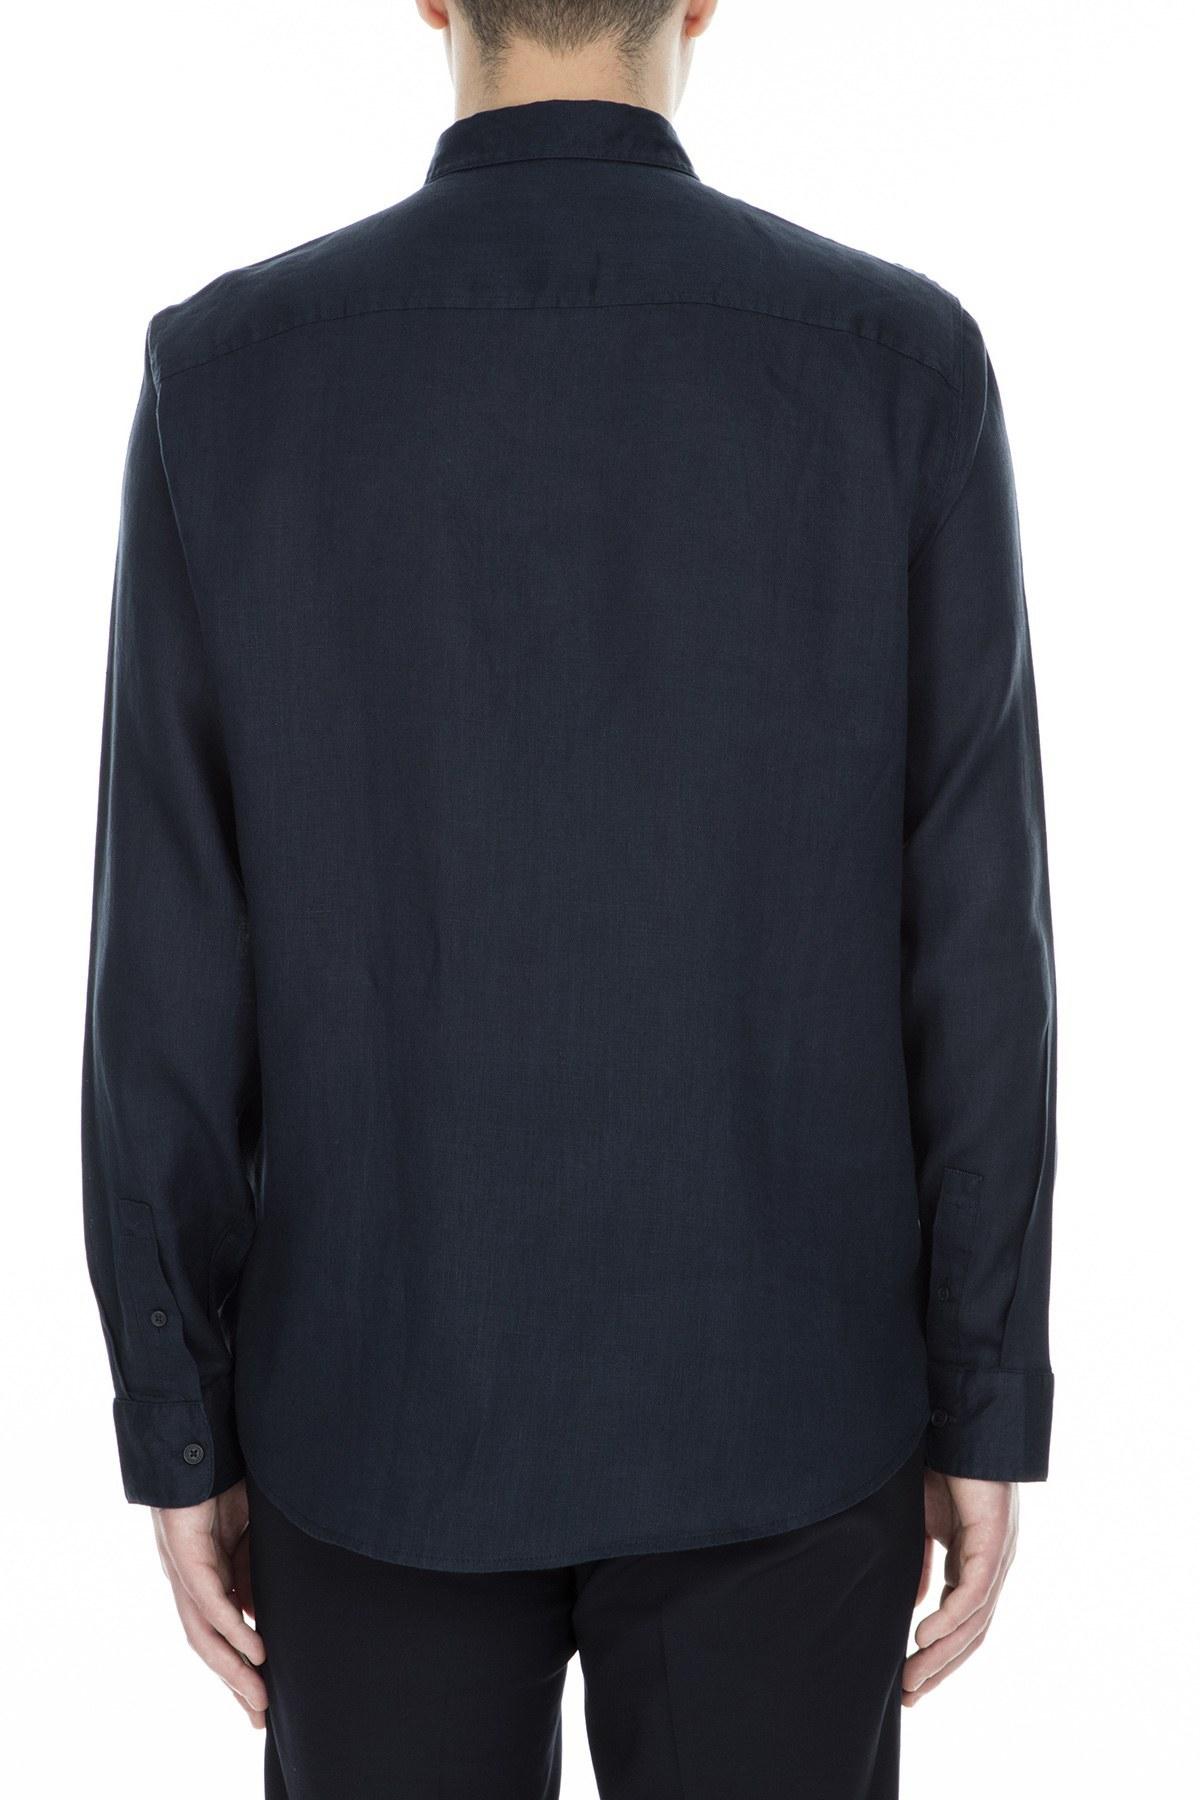 Armani Exchange Erkek Gömlek 3GZC48 ZNCFZ 1510 LACİVERT